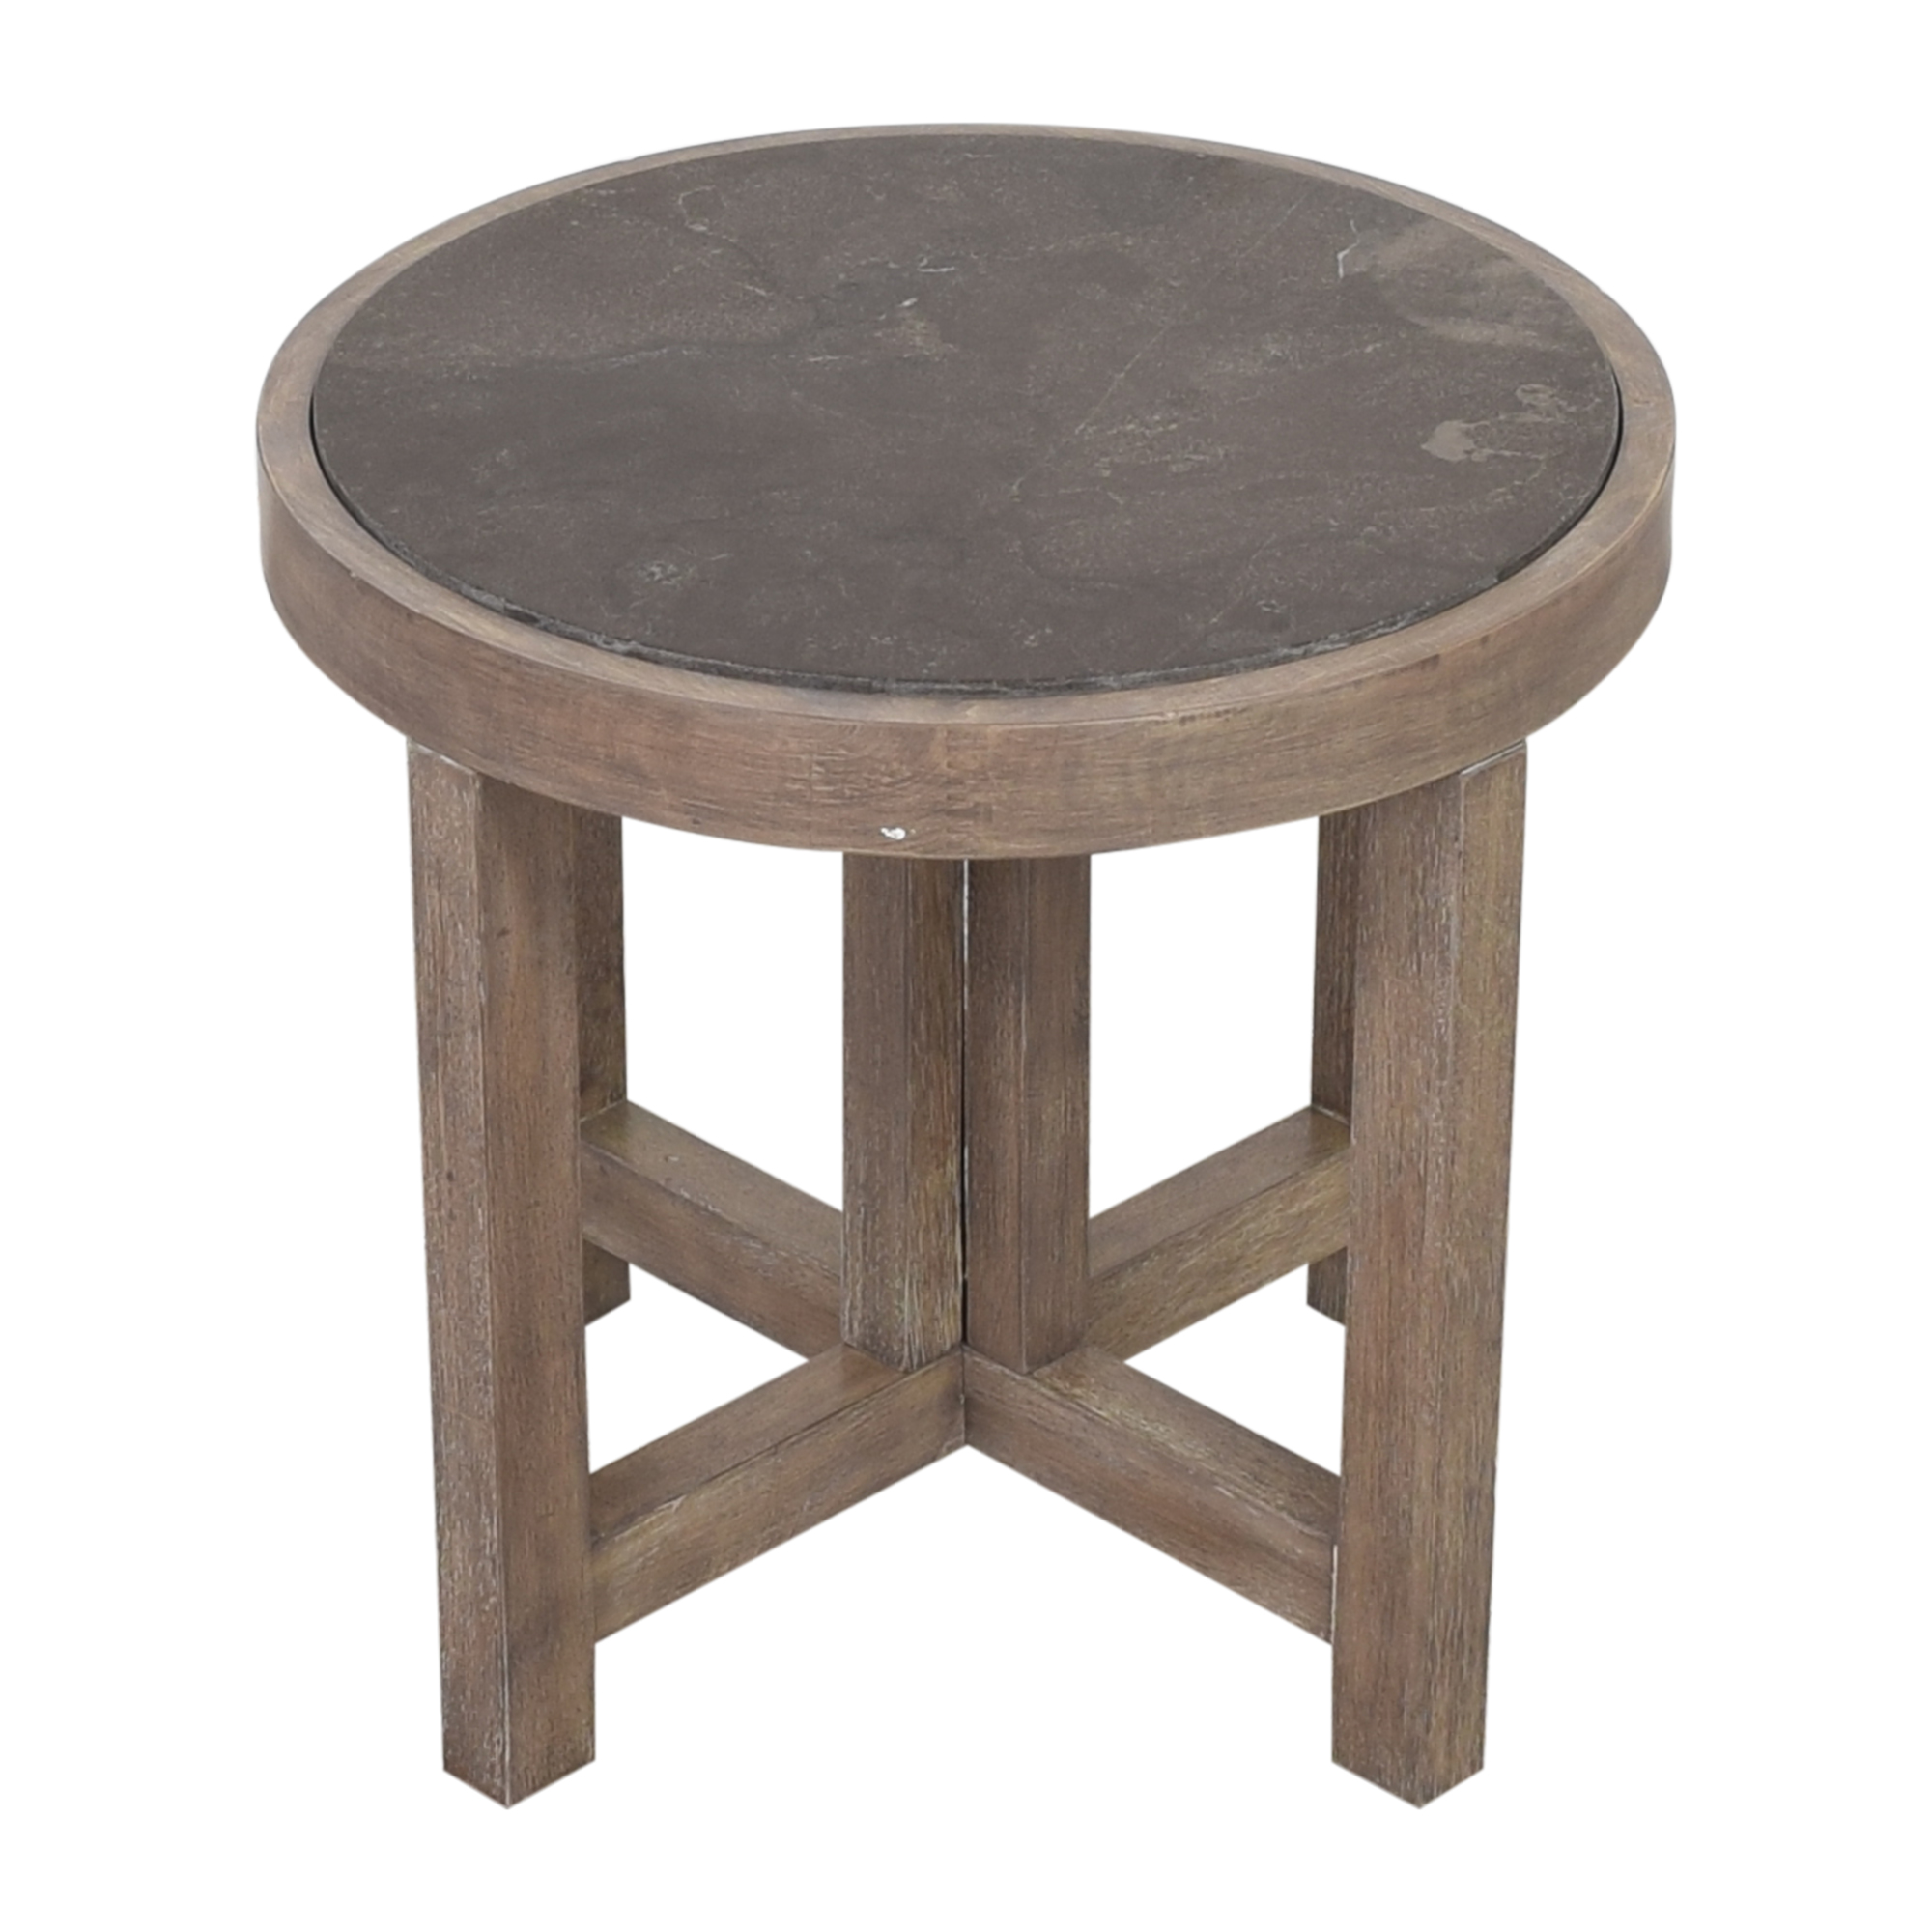 Bassett Furniture Compass Round Lamp Table Bassett Furniture